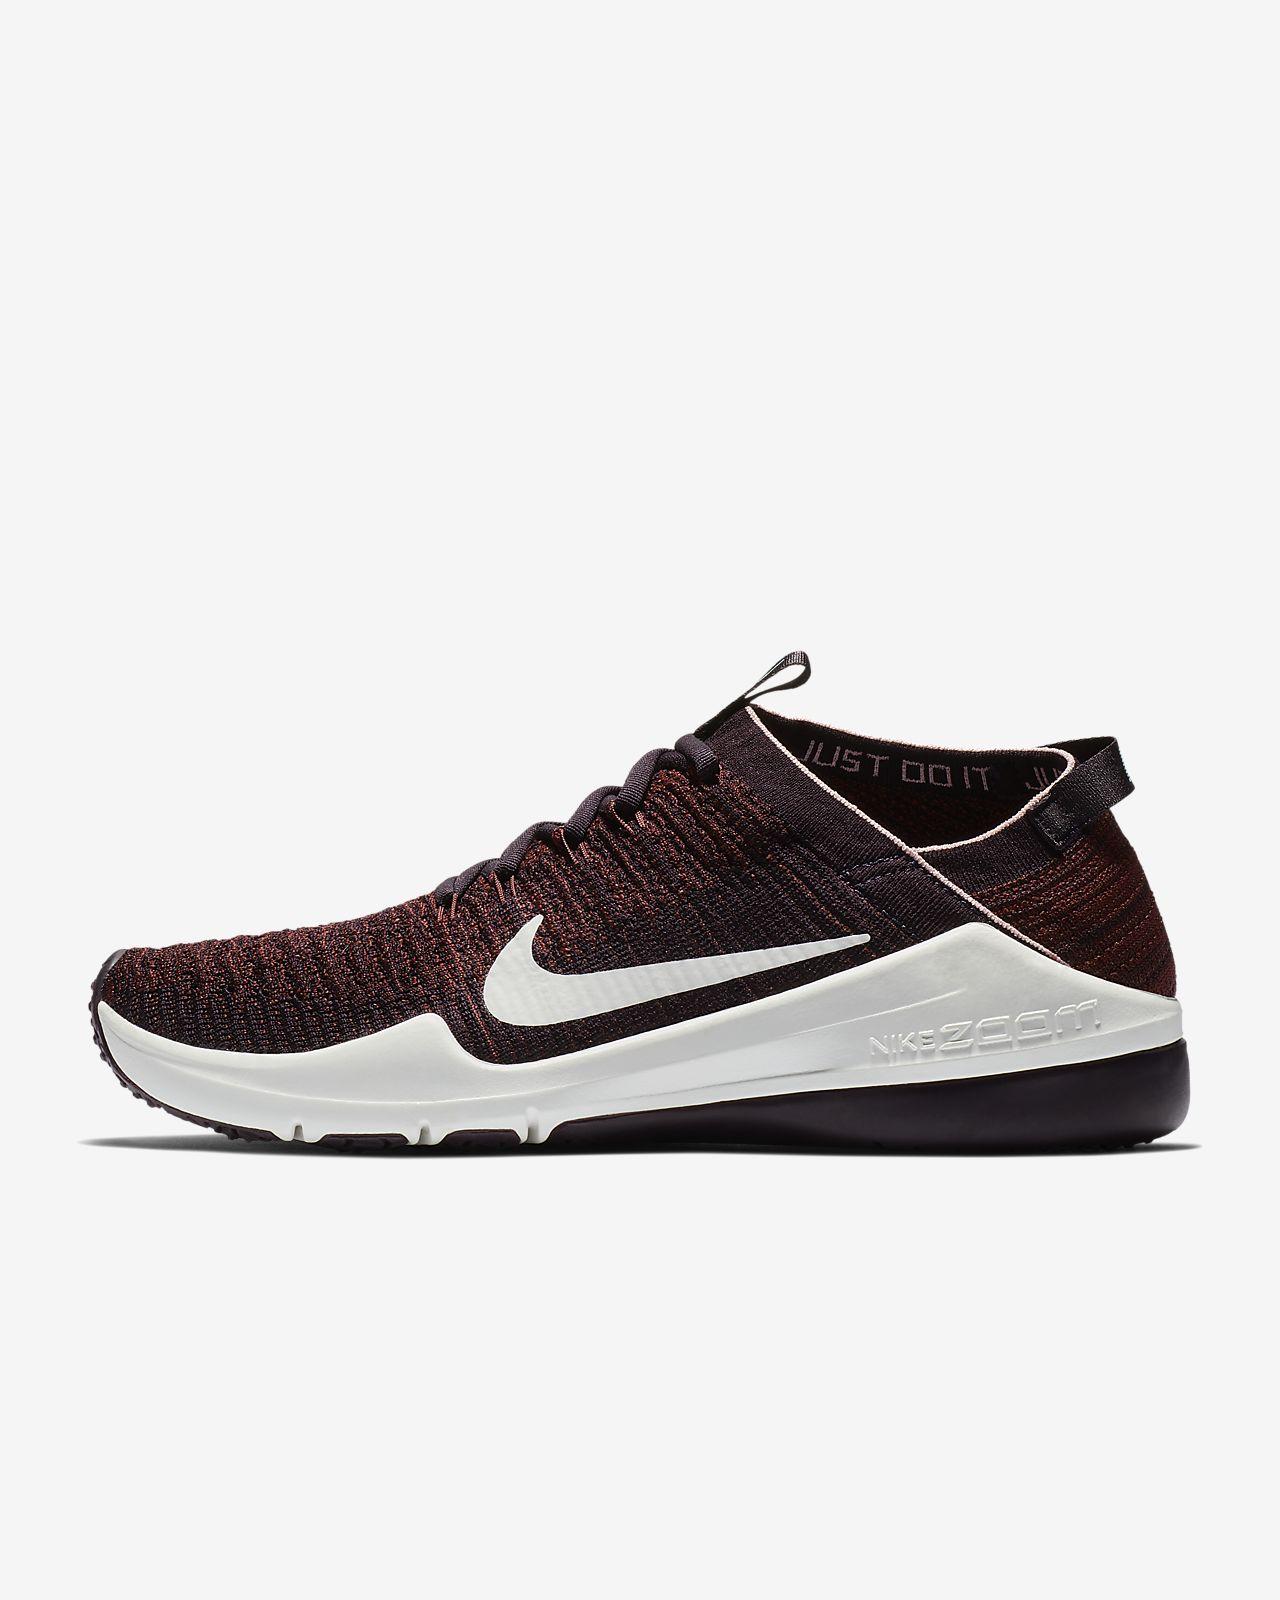 23732f3bde5 Nike Air Zoom Fearless Flyknit 2 Women s Gym Training Boxing Shoe ...